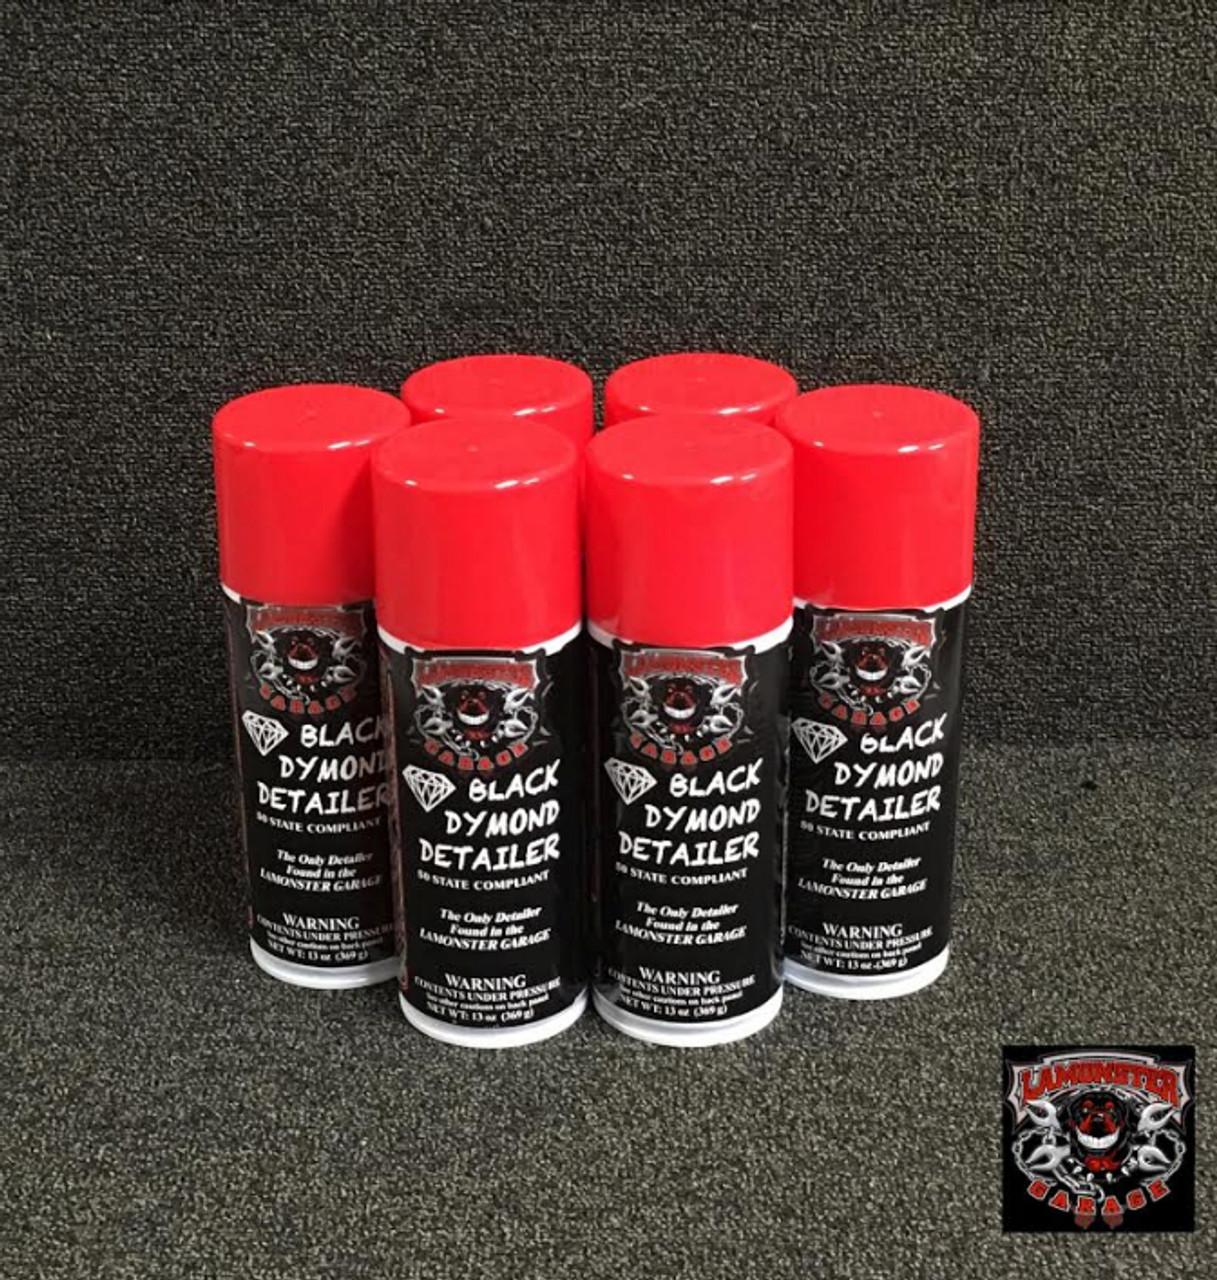 Lamonster Black Dymond (6 Can)  Price (Aerosol)